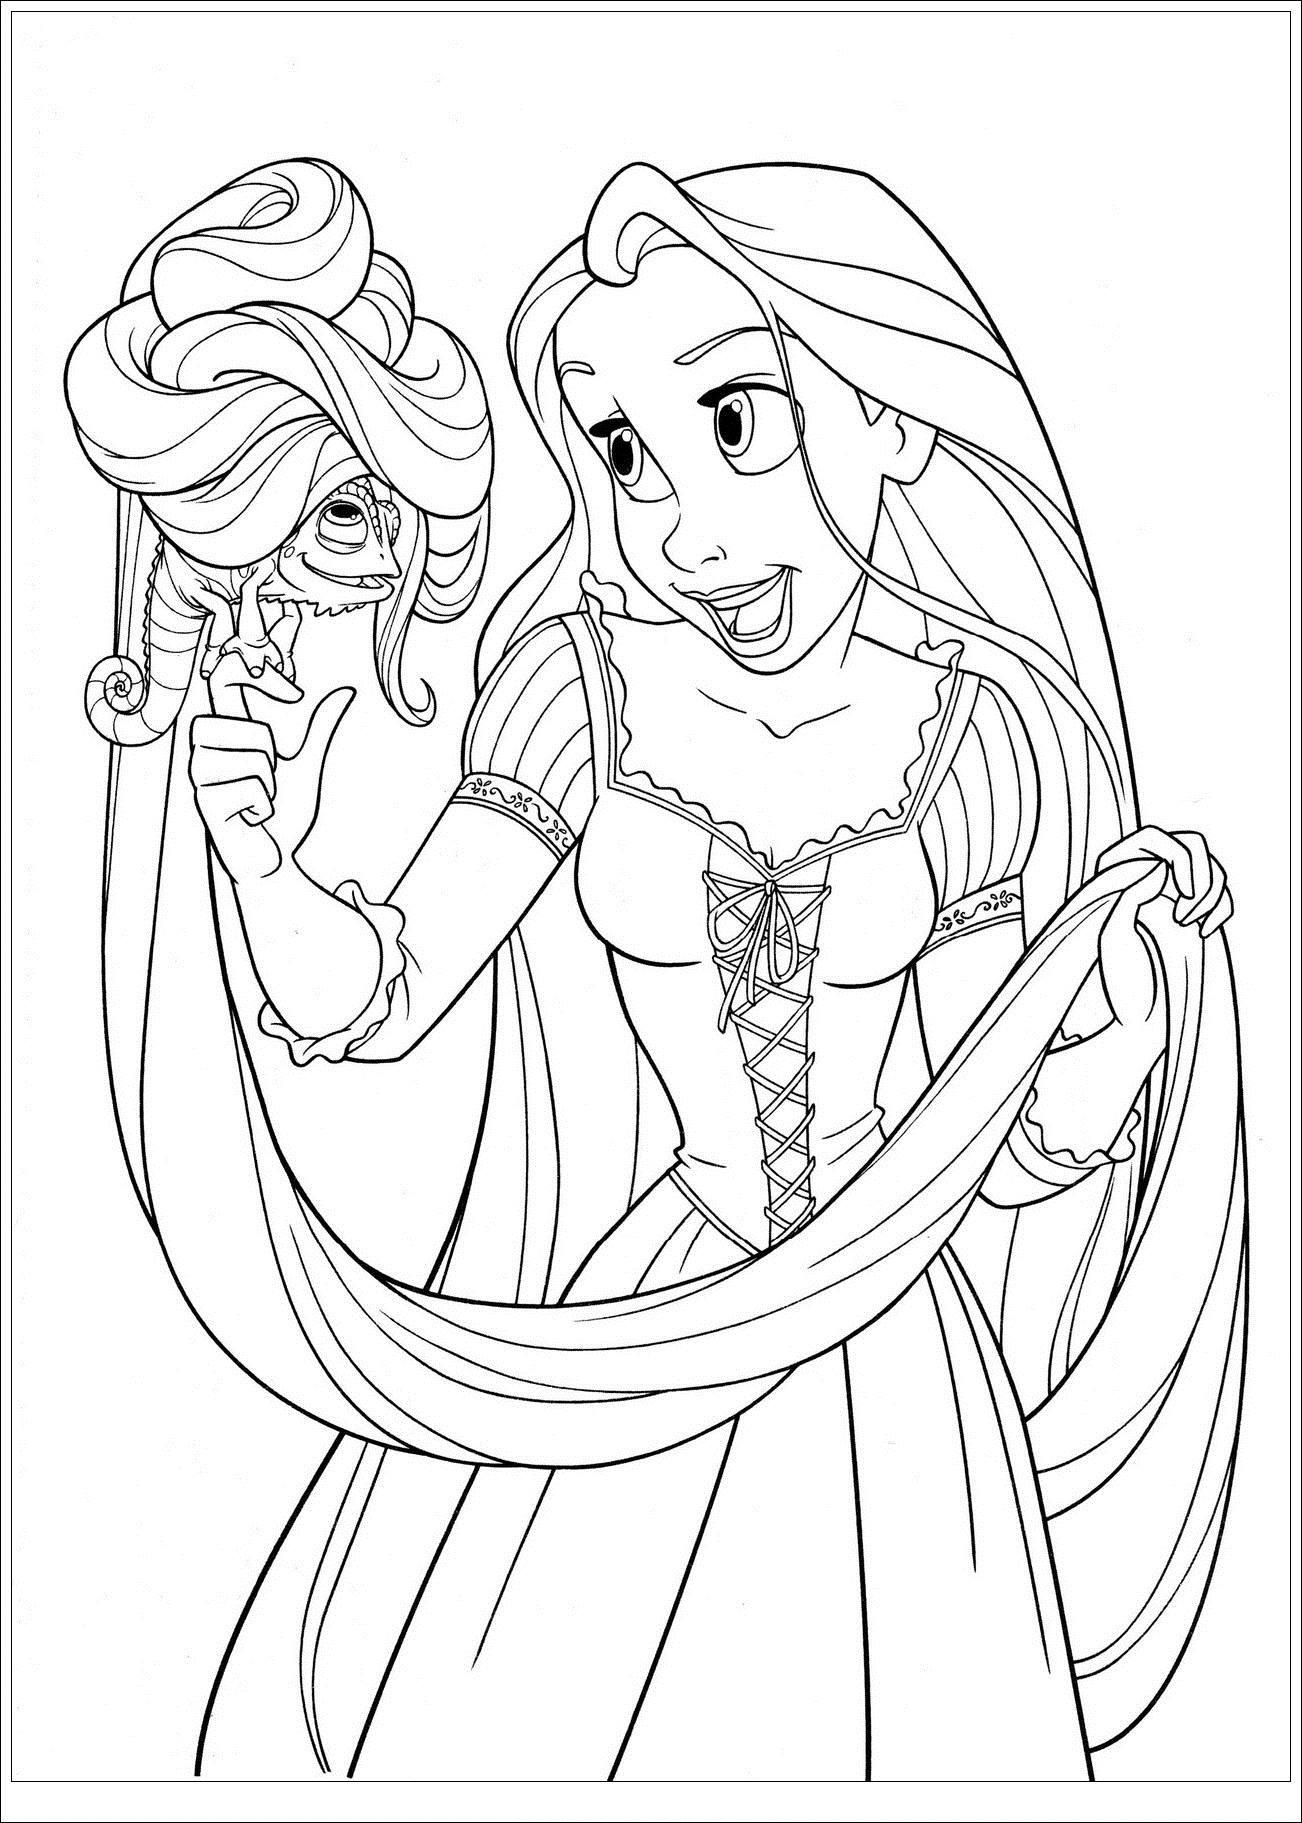 dessin magique princesse raiponce